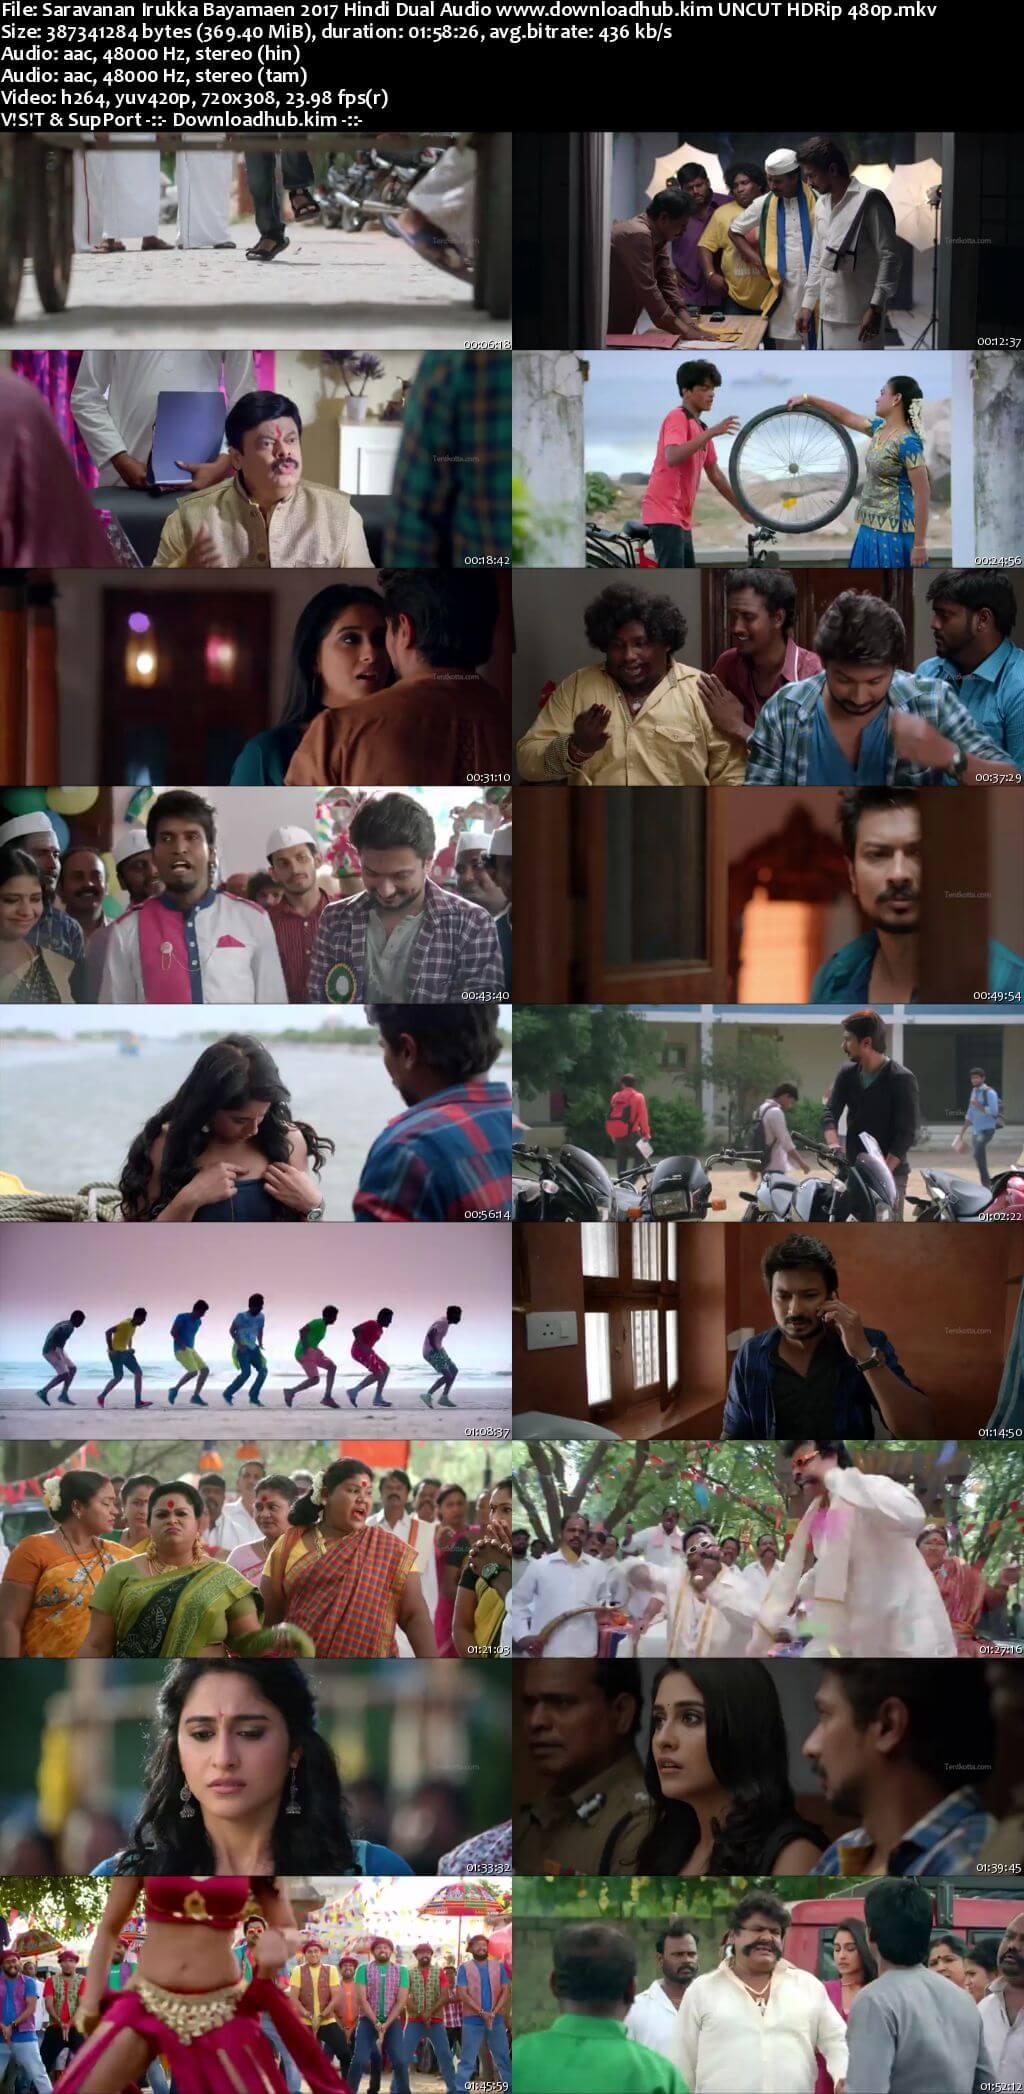 Saravanan Irukka Bayamaen 2017 Hindi Dual Audio 350MB UNCUT HDRip 480p